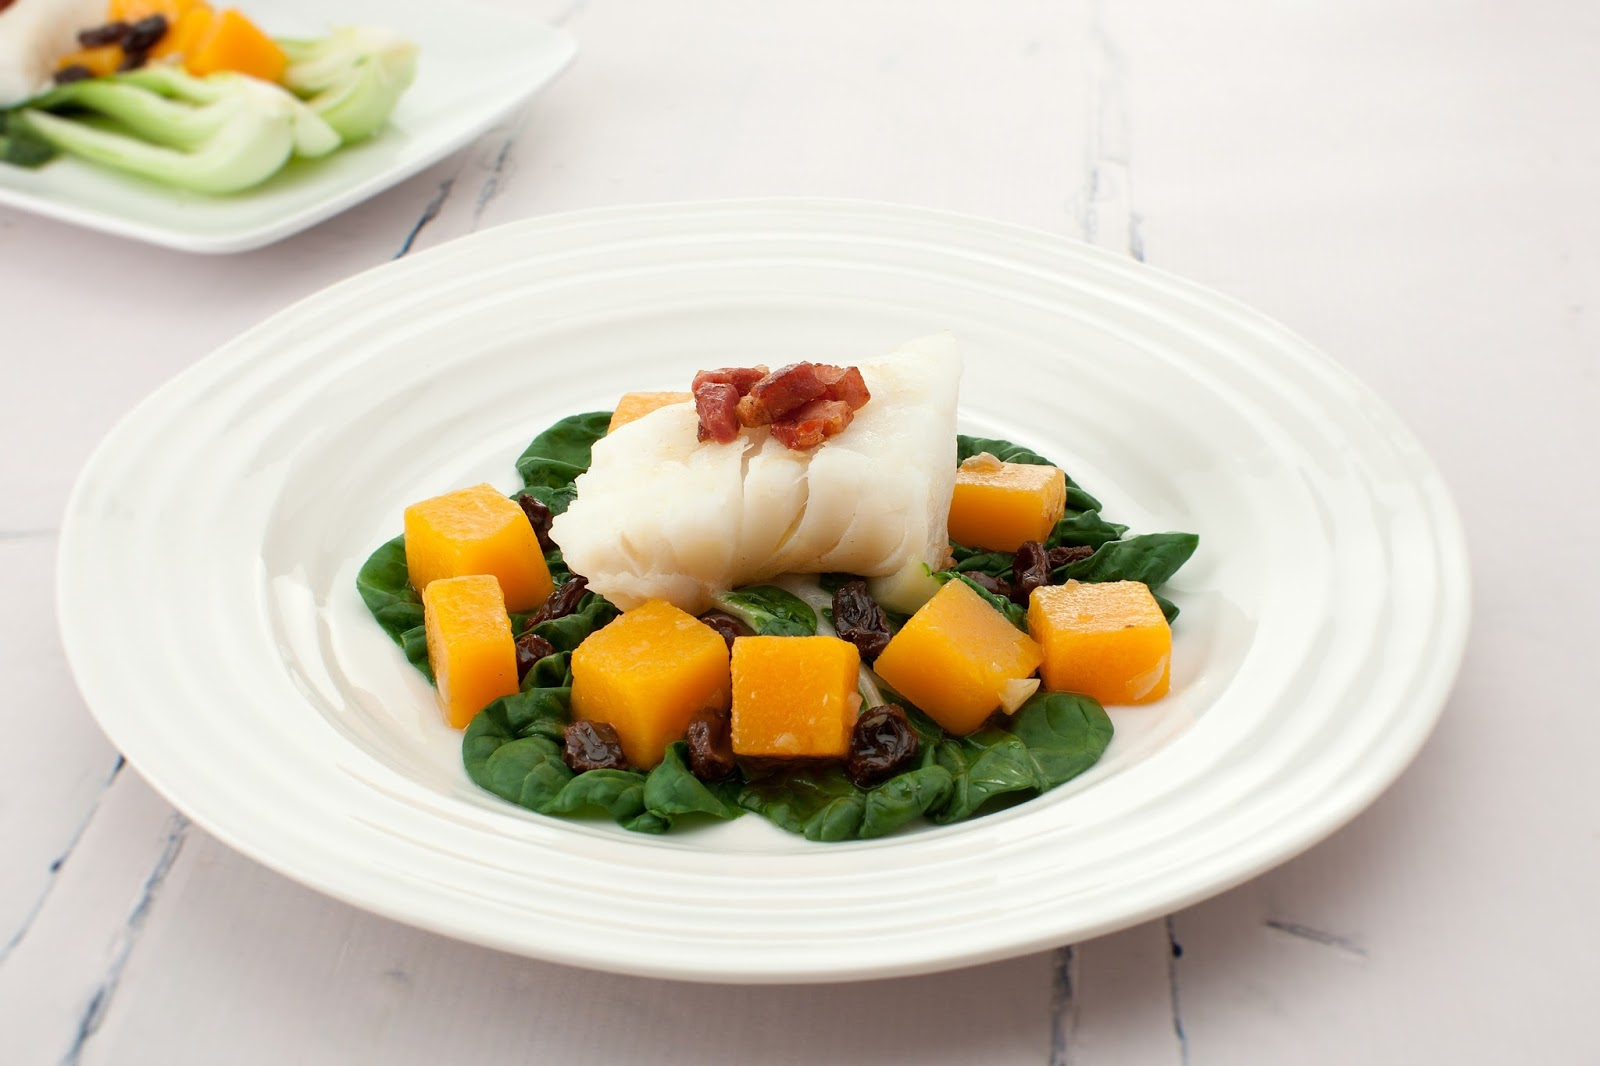 How To Make California Raisins Seared Cod With Pak Choi